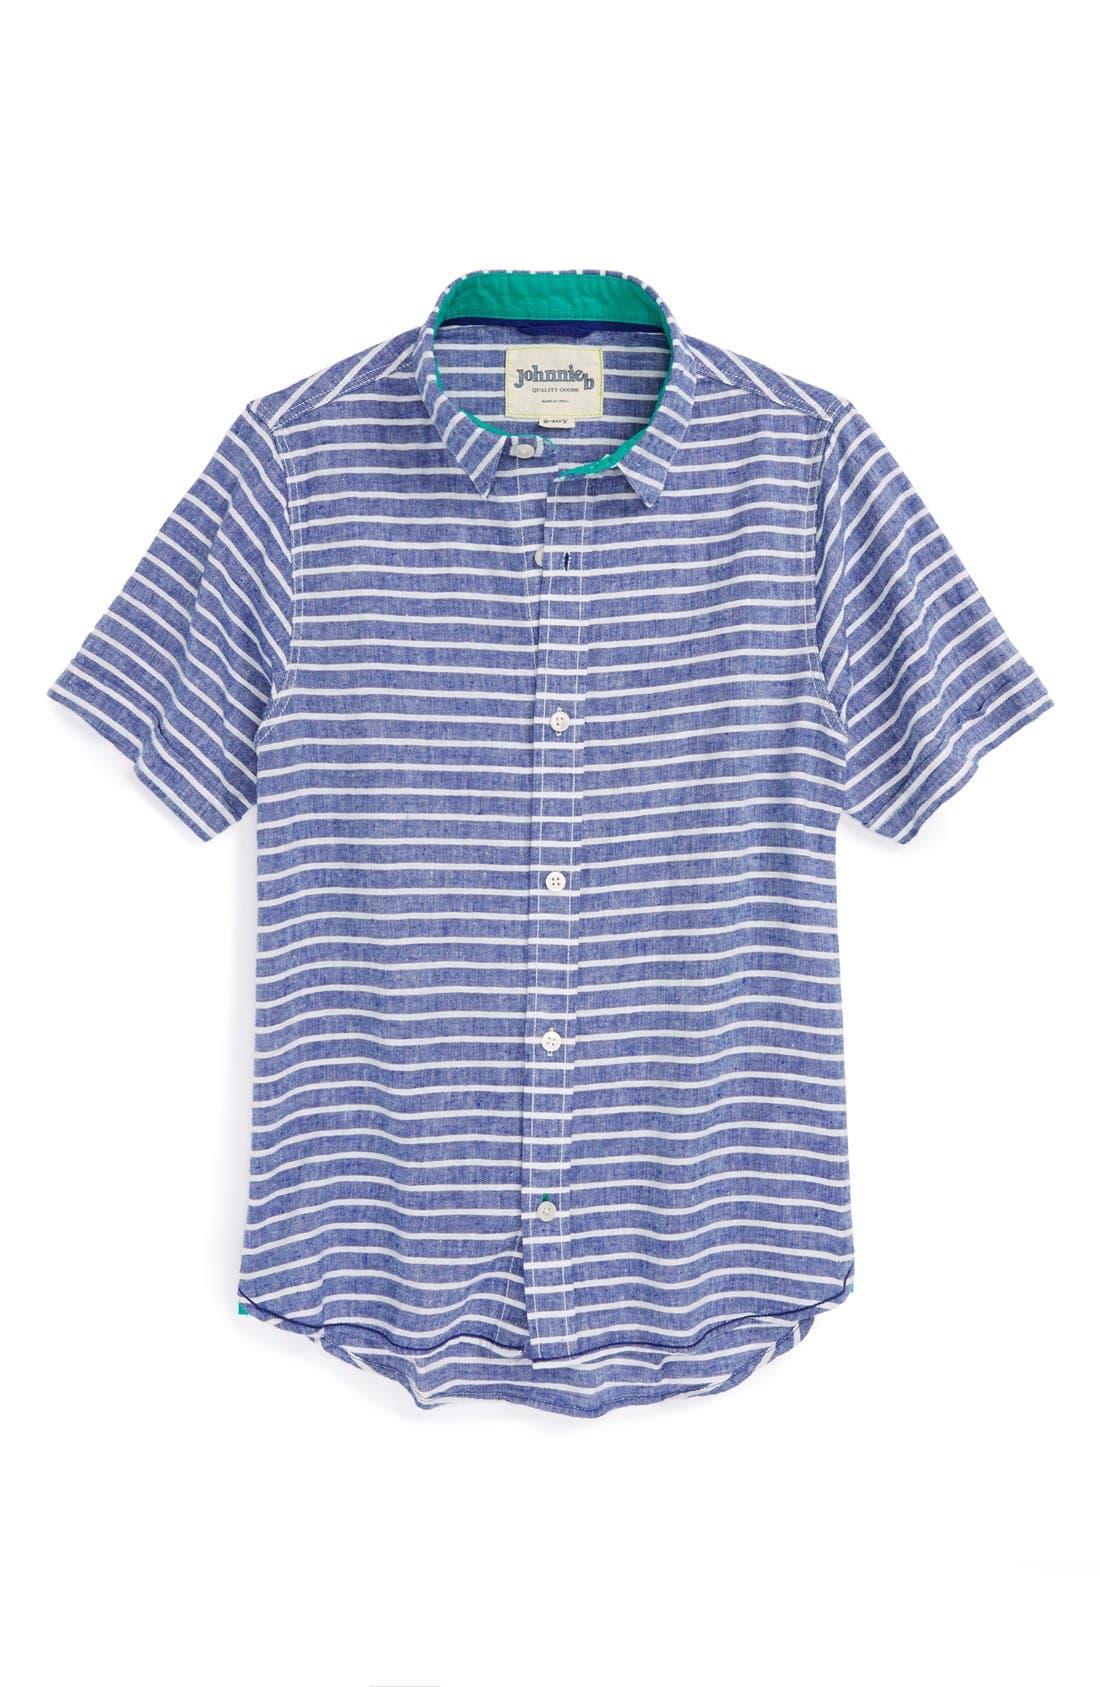 Main Image - Johnnie B by Boden 'Summer' Button Front Linen & Cotton Shirt (Big Boys)